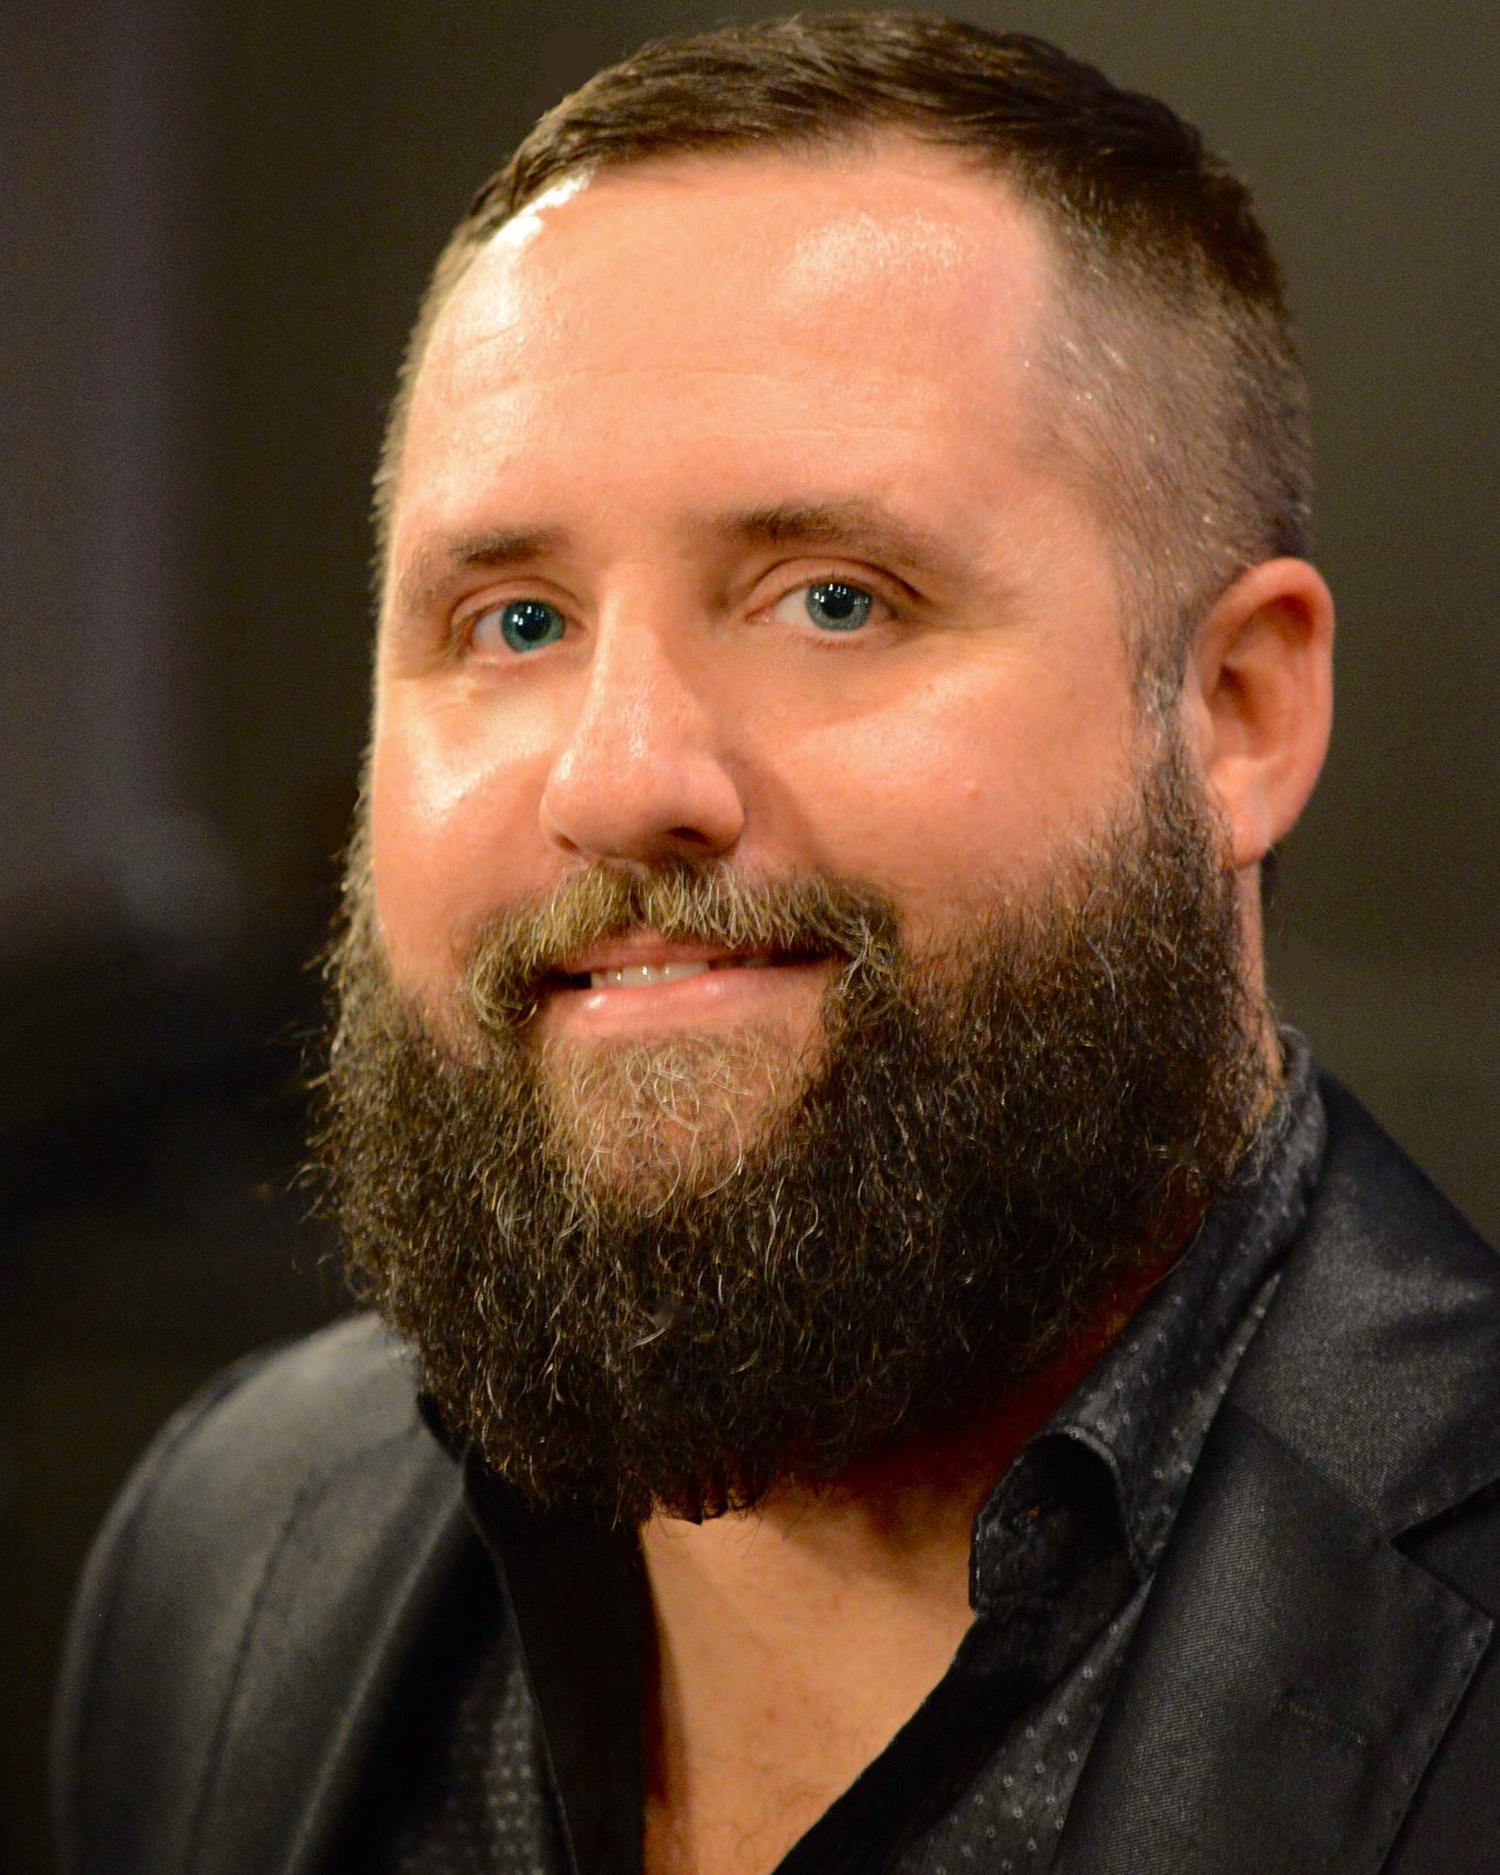 BWW Interview: Director Josh Shaw of DON GIOVANNI at The Vortex